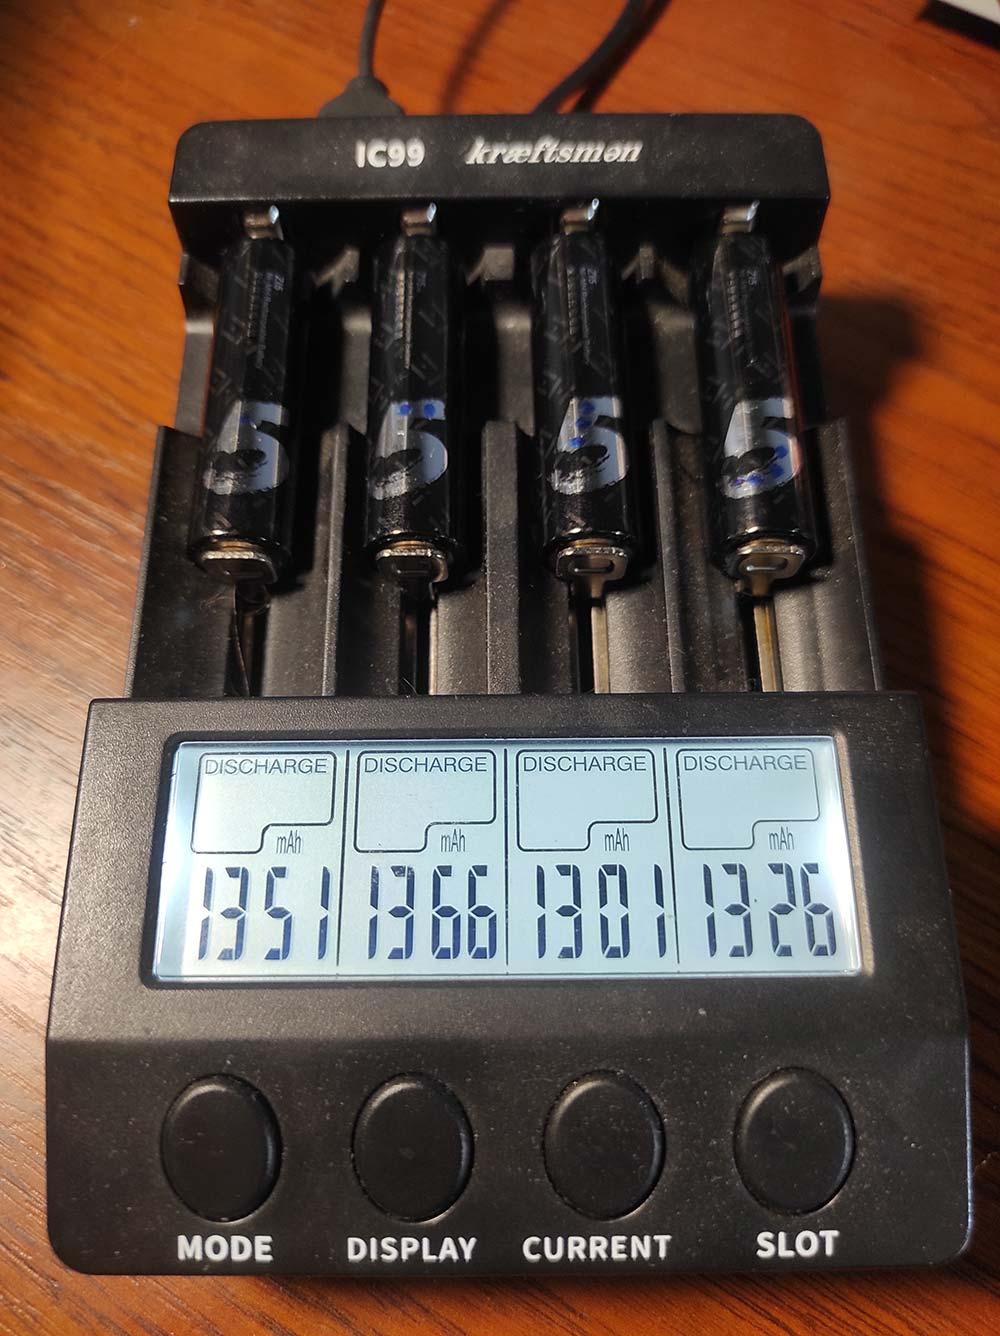 xiaomi zmi zi5 1700 АА саморазряд тест